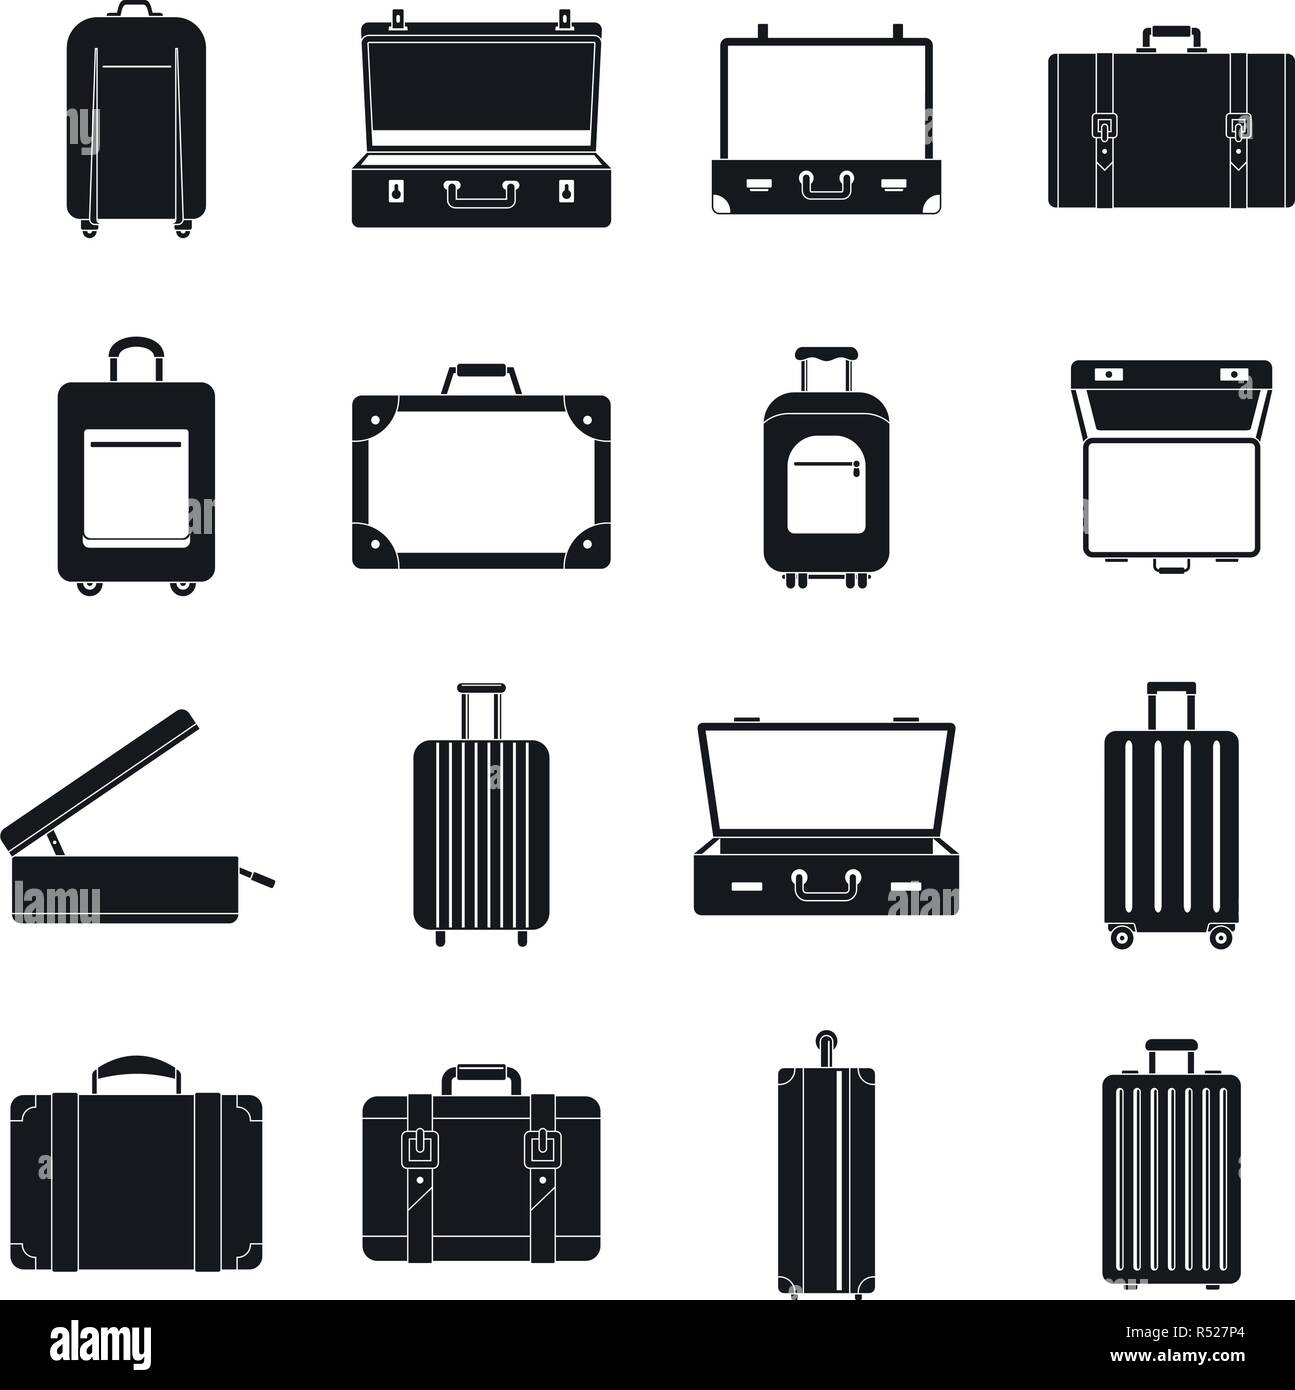 7535597b0 Maleta de Viaje maletín bolsa de equipaje conjunto de iconos. Ilustración  simple de 16 maletas